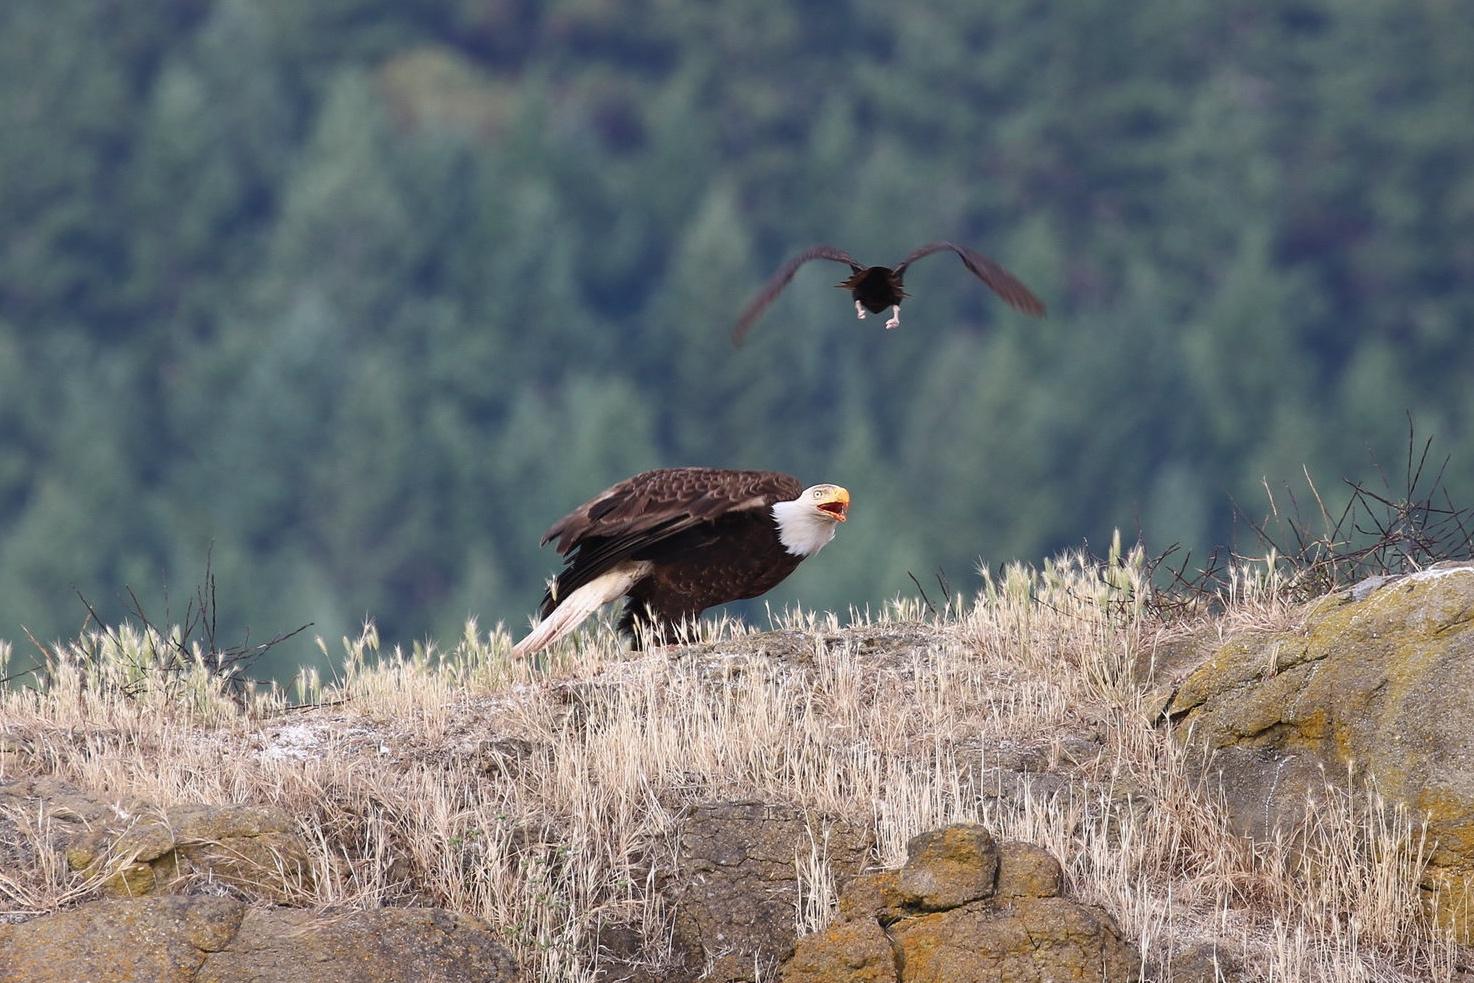 Interrupting an Eagle feast. Photo by Rebeka Pirker (3:30).